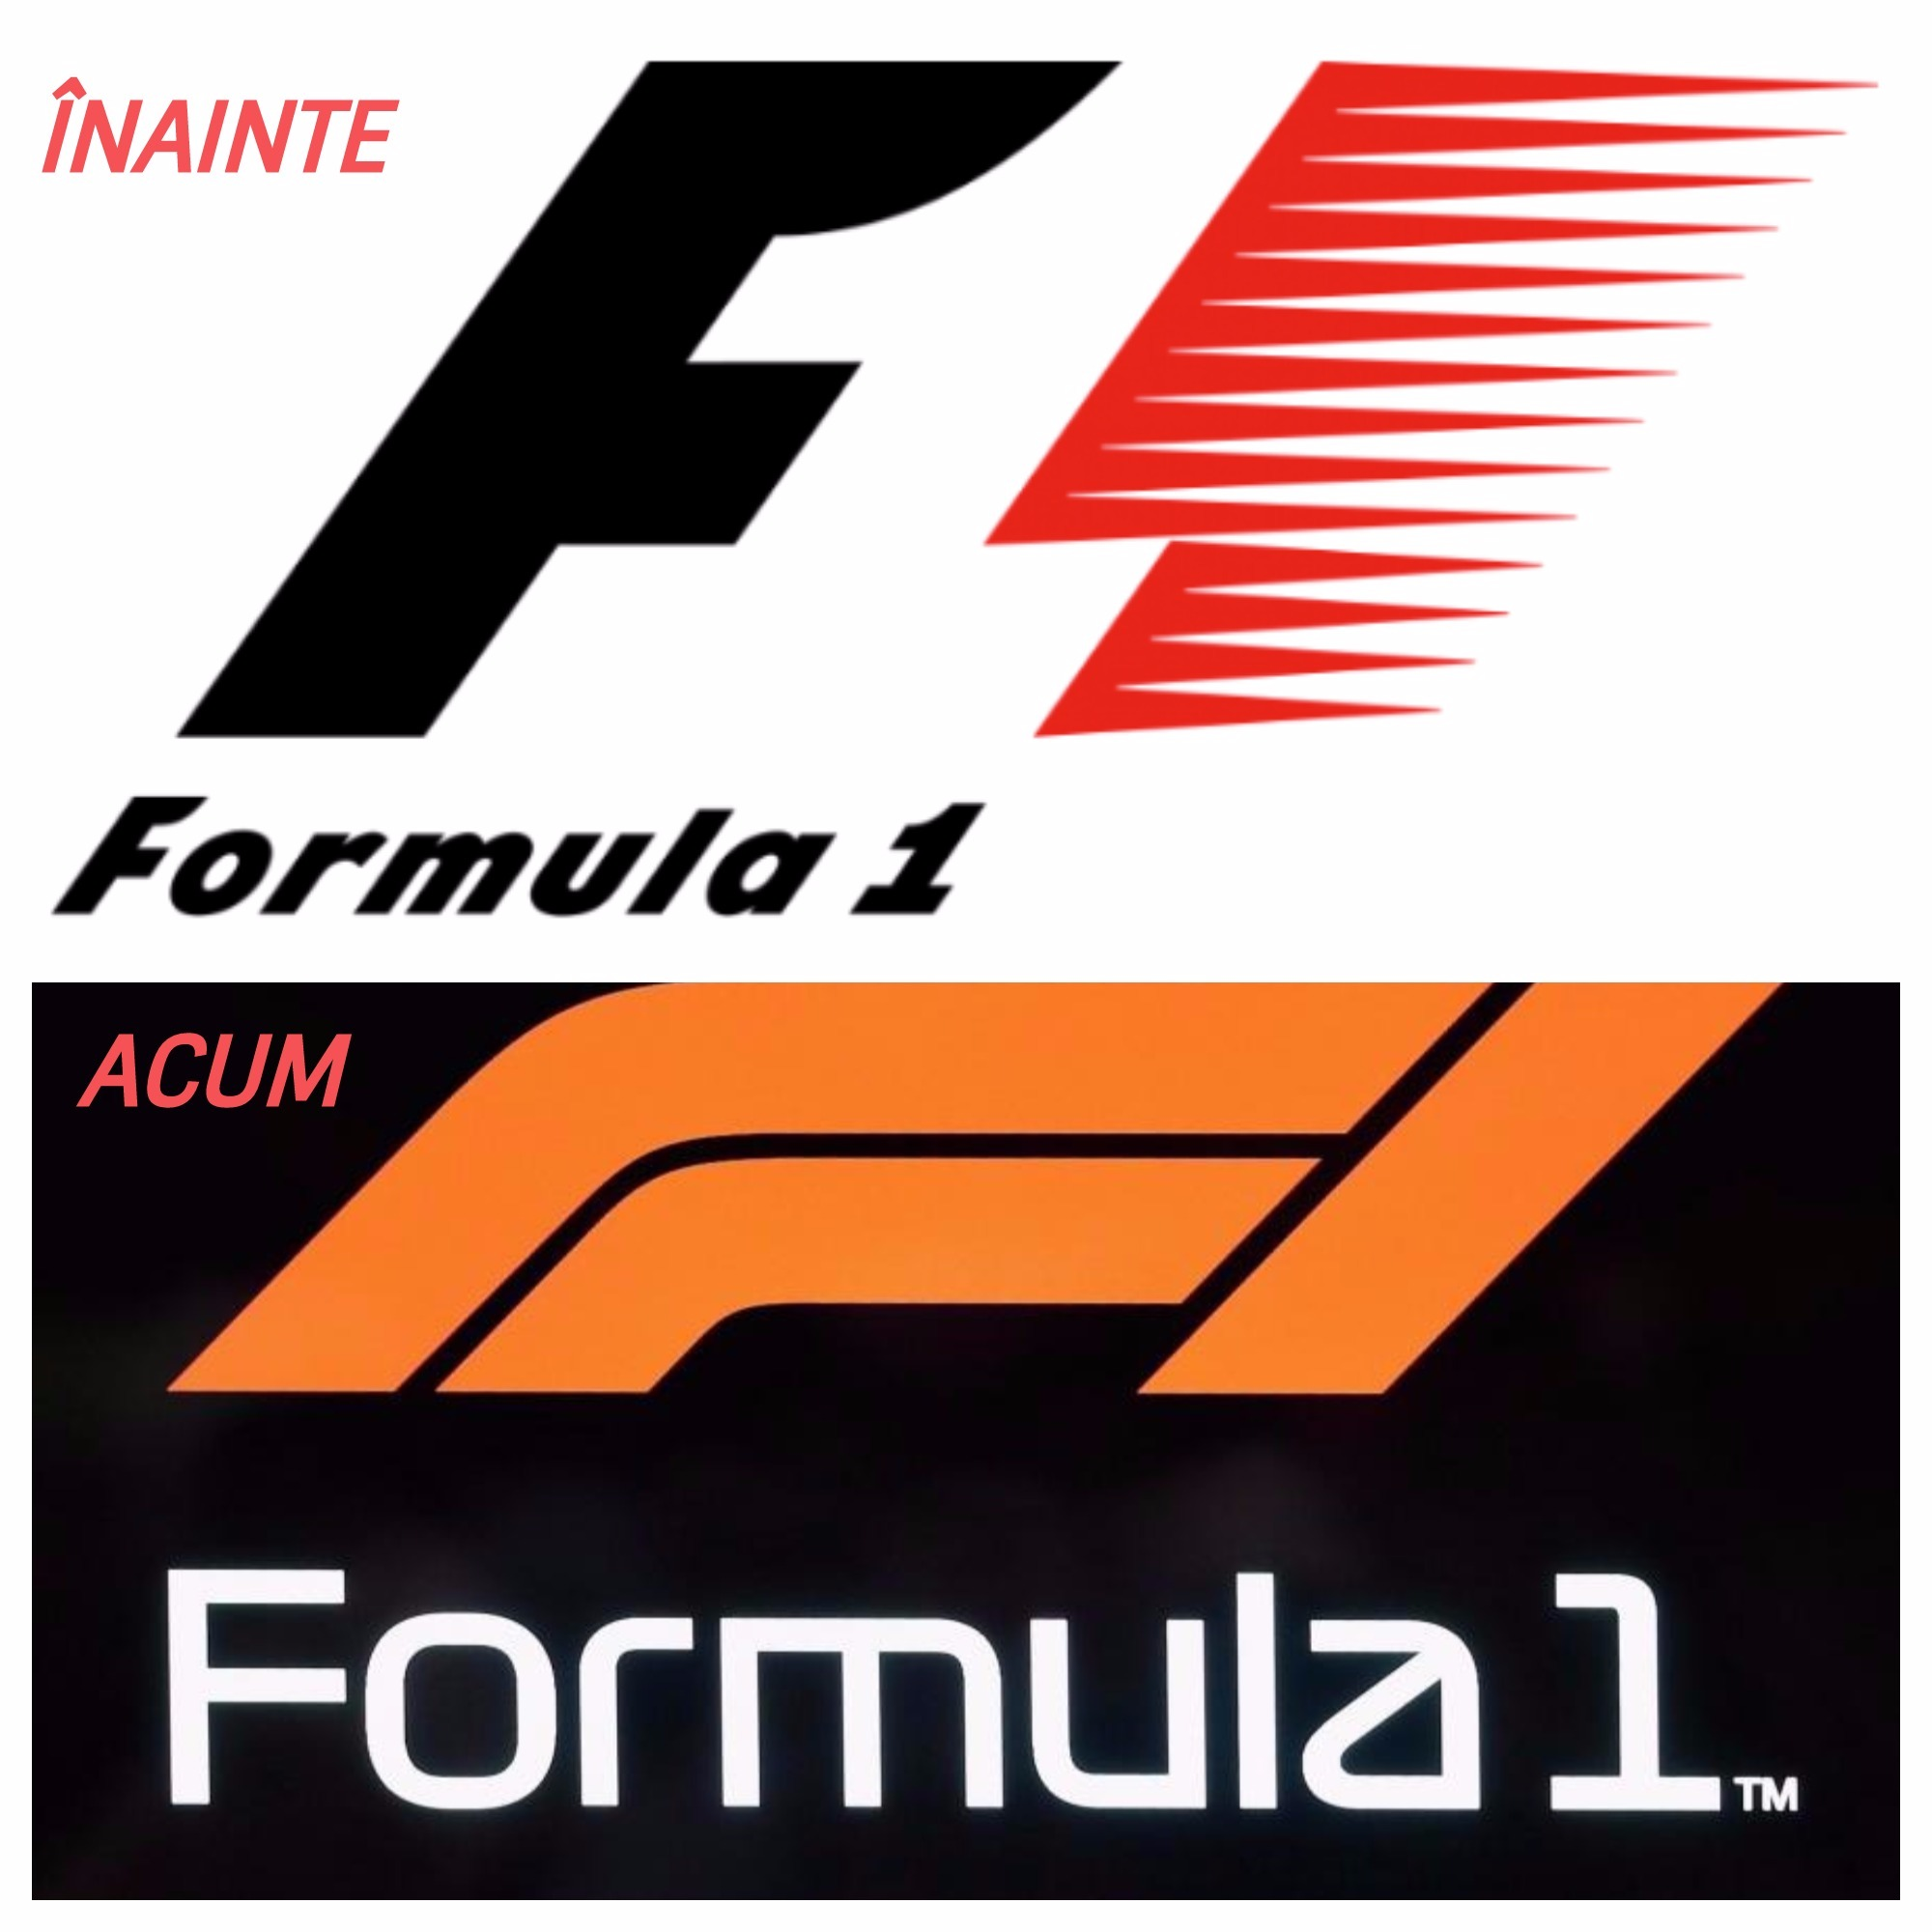 Formula 1 isi schimba logo-ul pentru prima data in 23 de ani